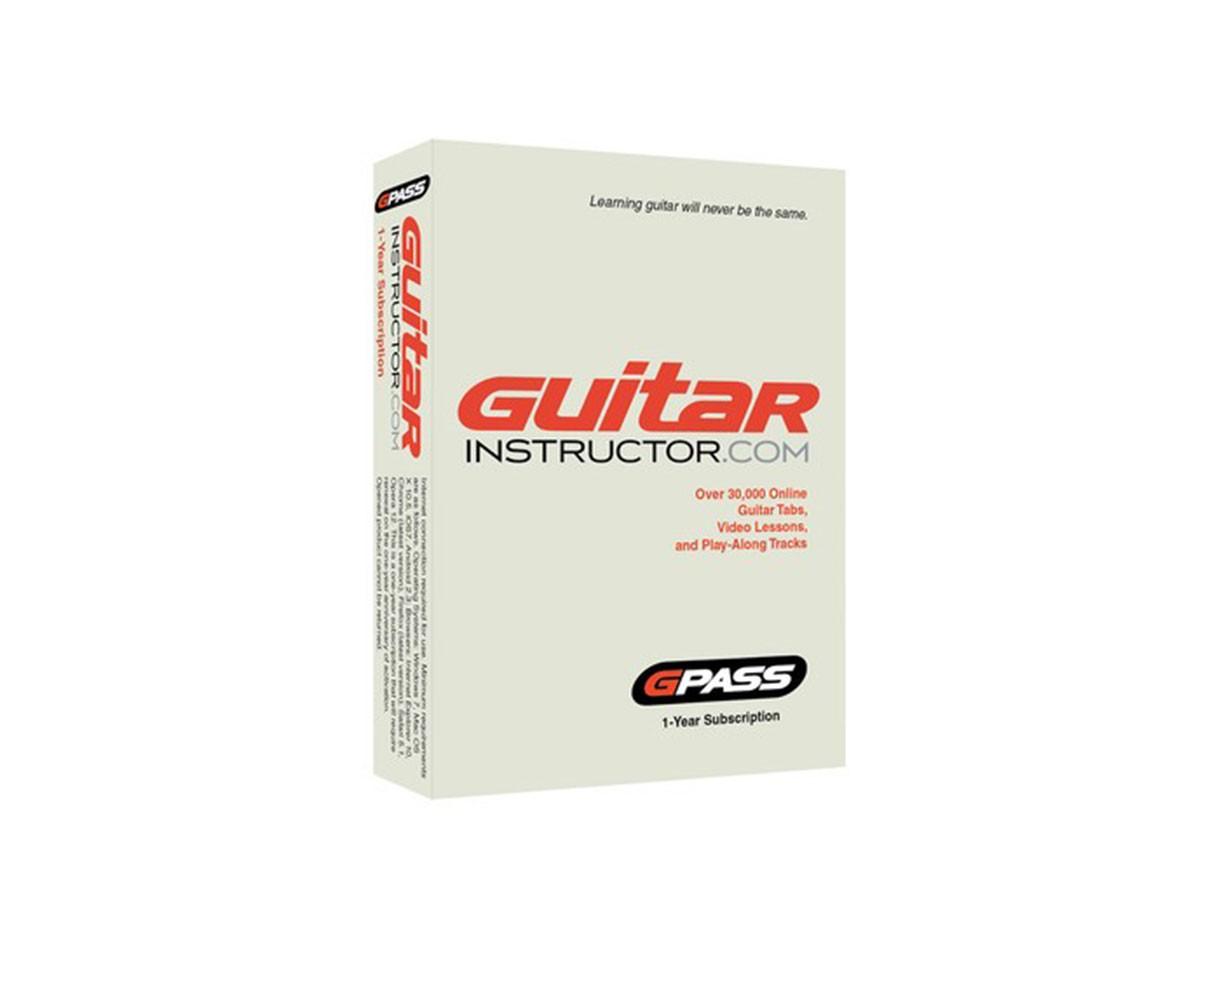 GuitarInstruct 1-Year G-Pass Subscription